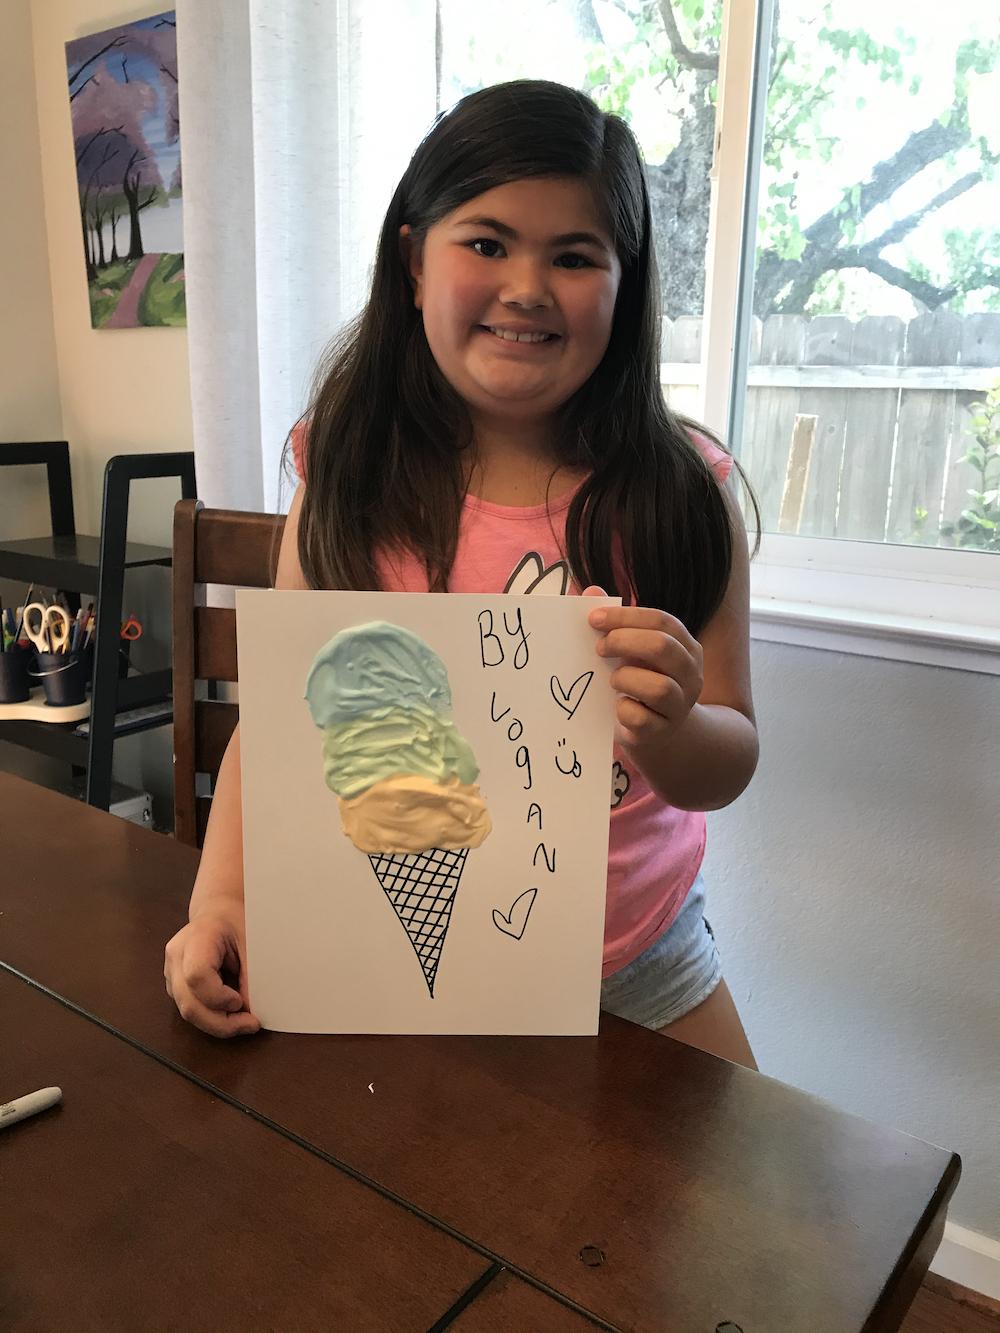 Family Fun: Cloud Paint with Logan